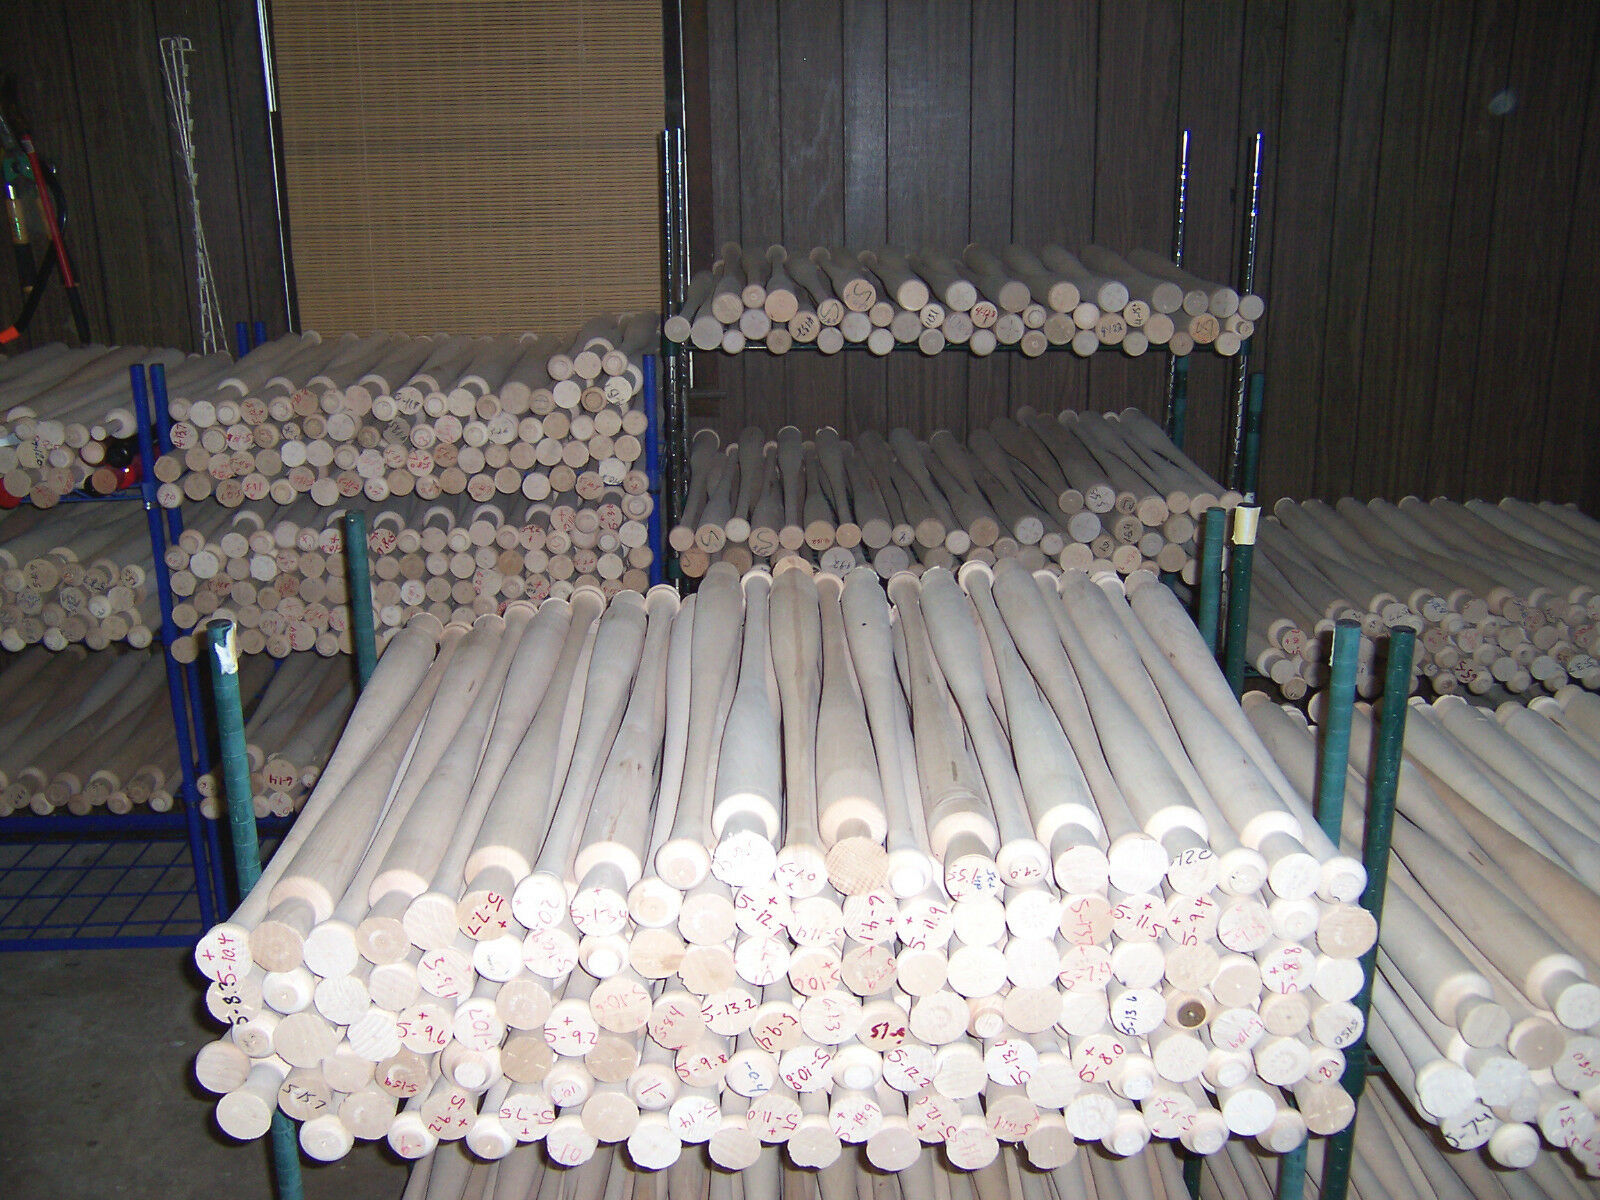 Wood Baseball Bats (Blem Bats) Maple, Ash, Birch - SELECT THE LENGTHS YOU  NEED · $15 00 · Baseball-Adult & High School